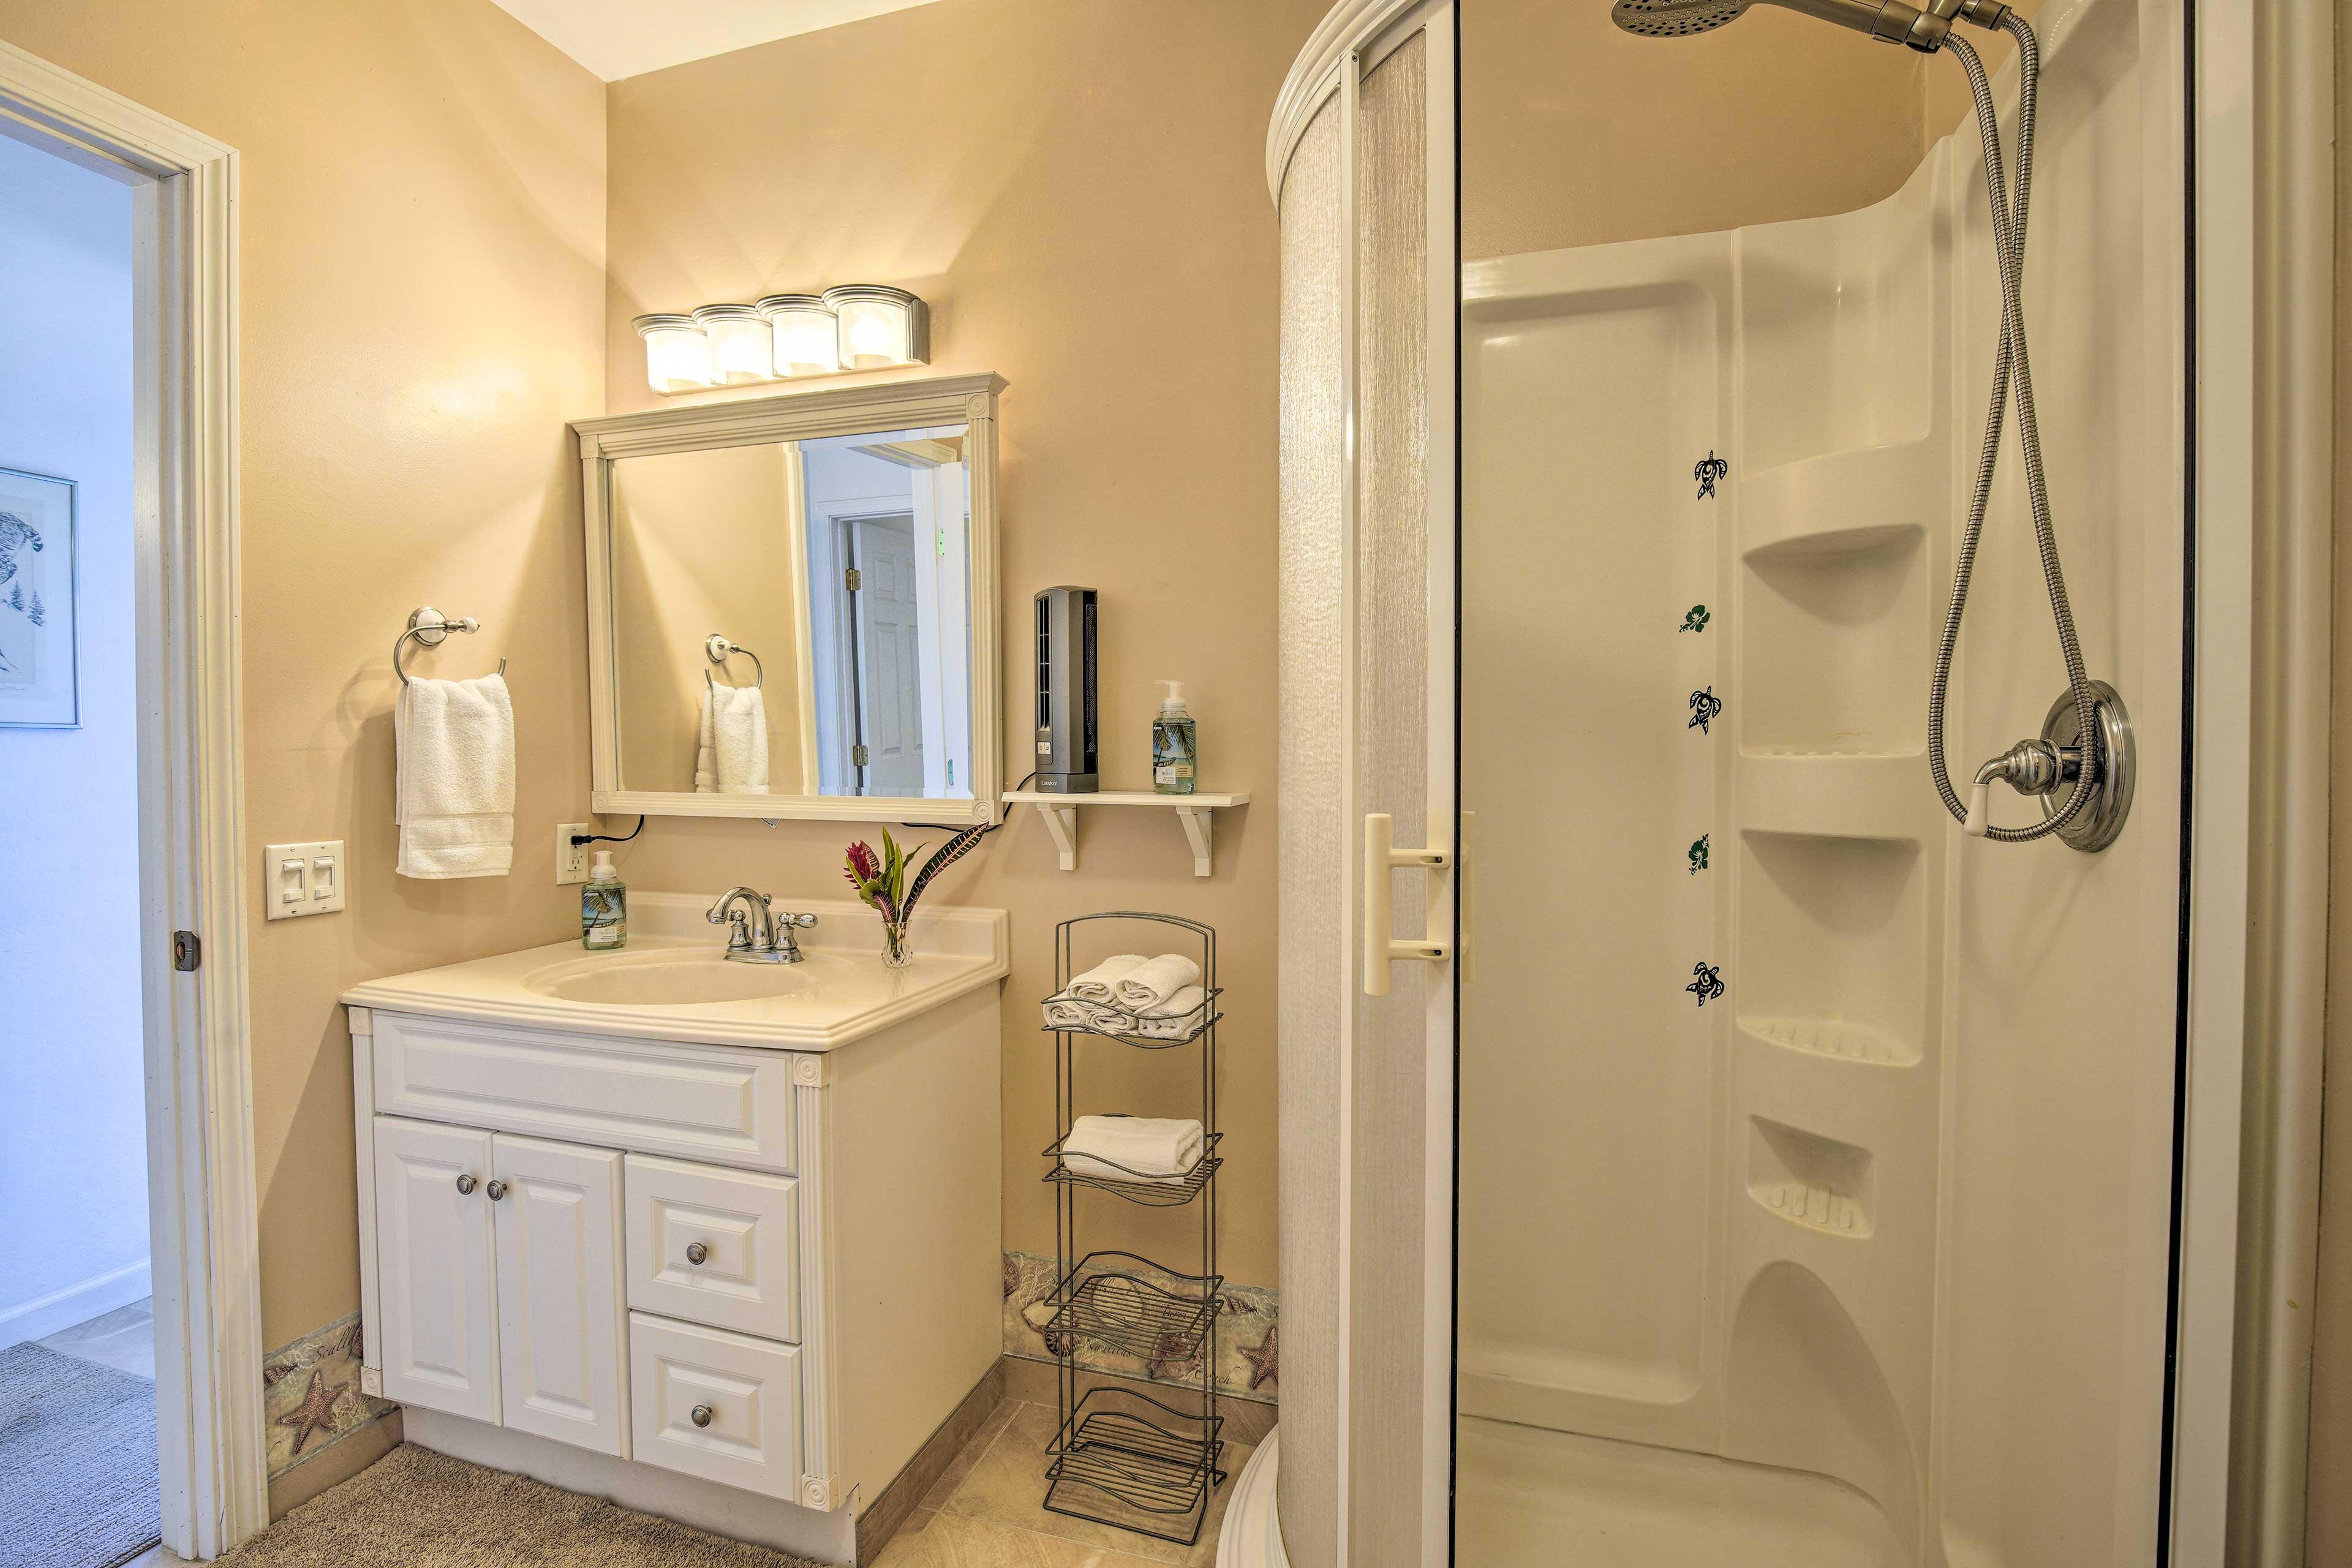 Bathroom | Towels Provided